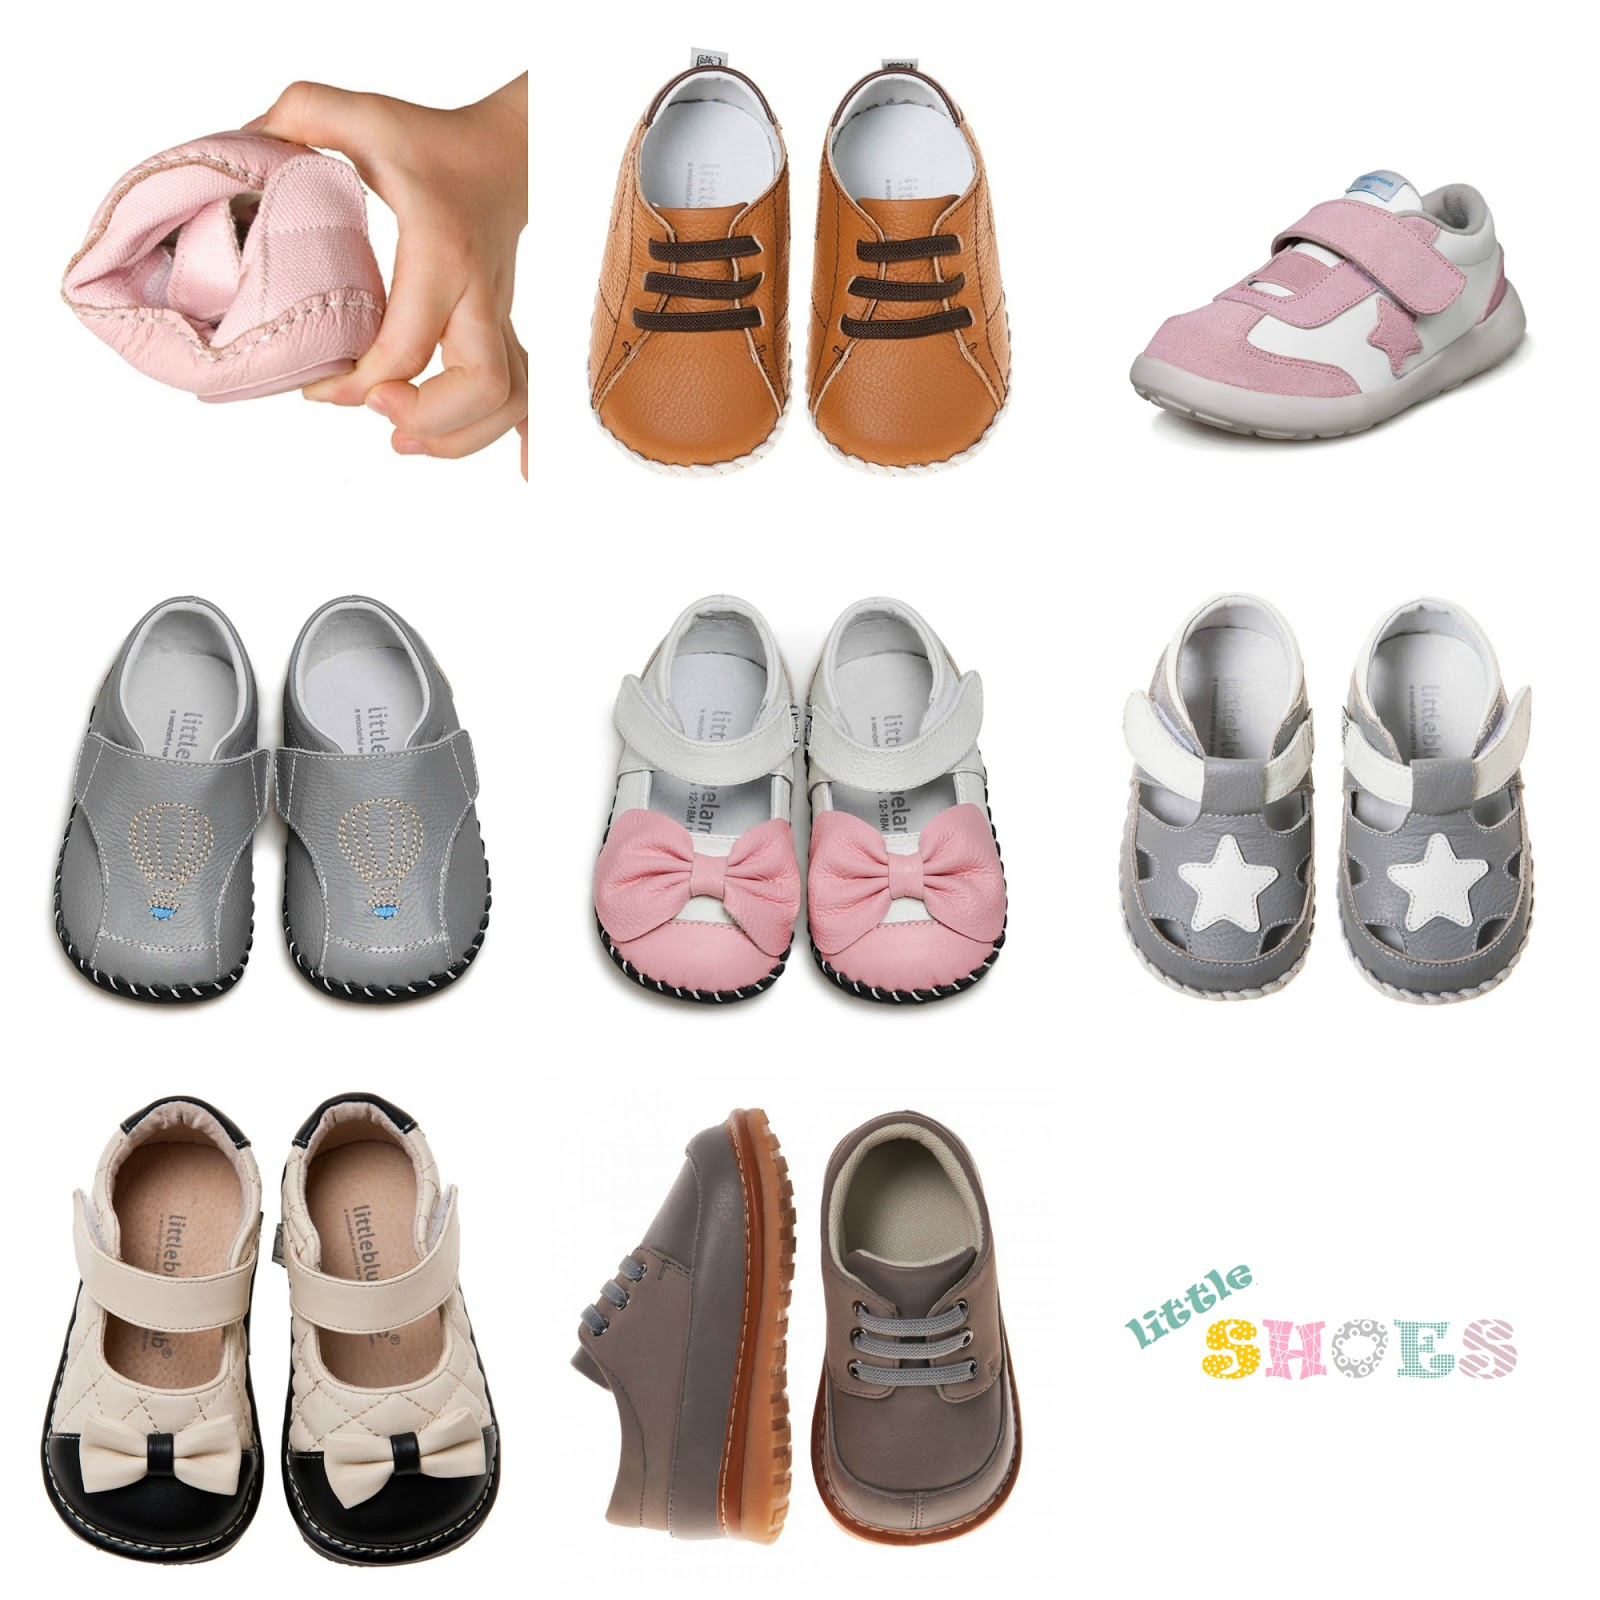 2bfc90ff8c6 Madame Coquette  GA   poukaz do eshopu Little Shoes